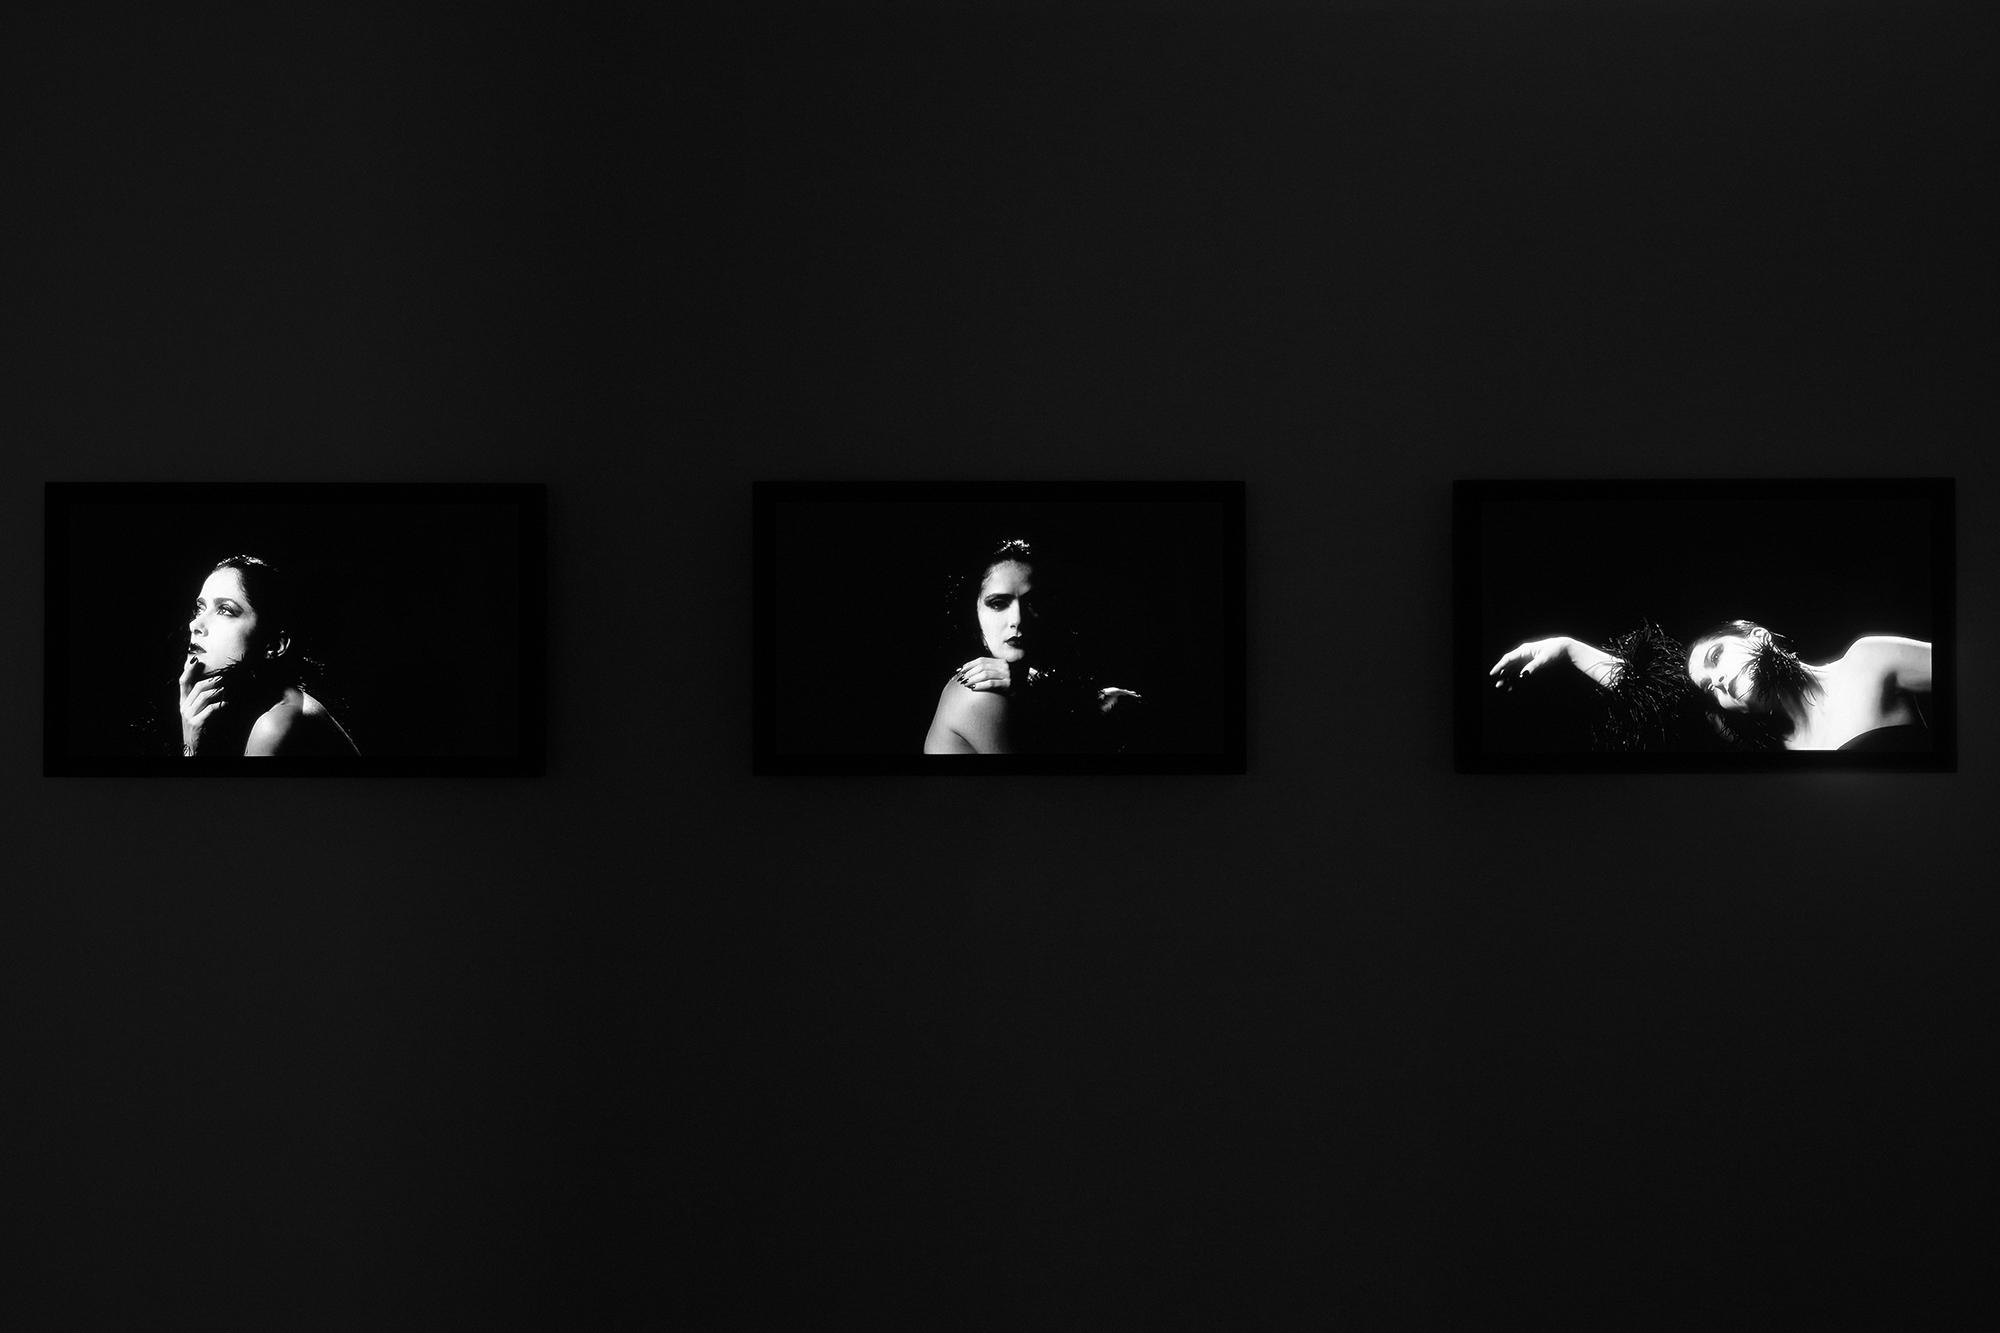 Robert_Willson_exhibition_25.jpg